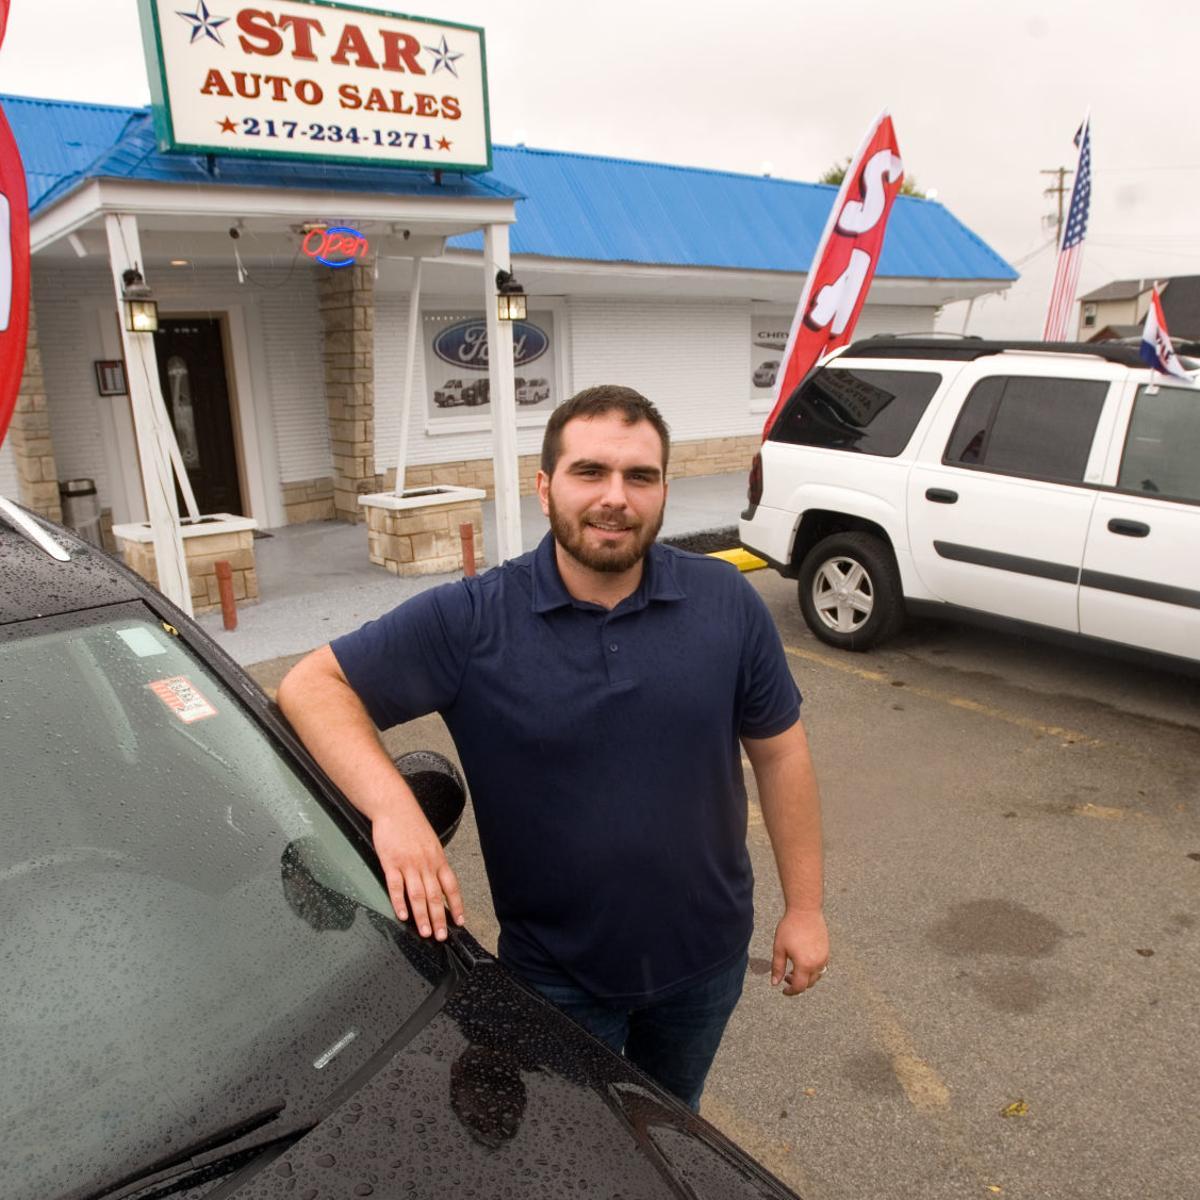 Star Auto Sales >> Star Auto Sales Moves To New Location In Mattoon Local